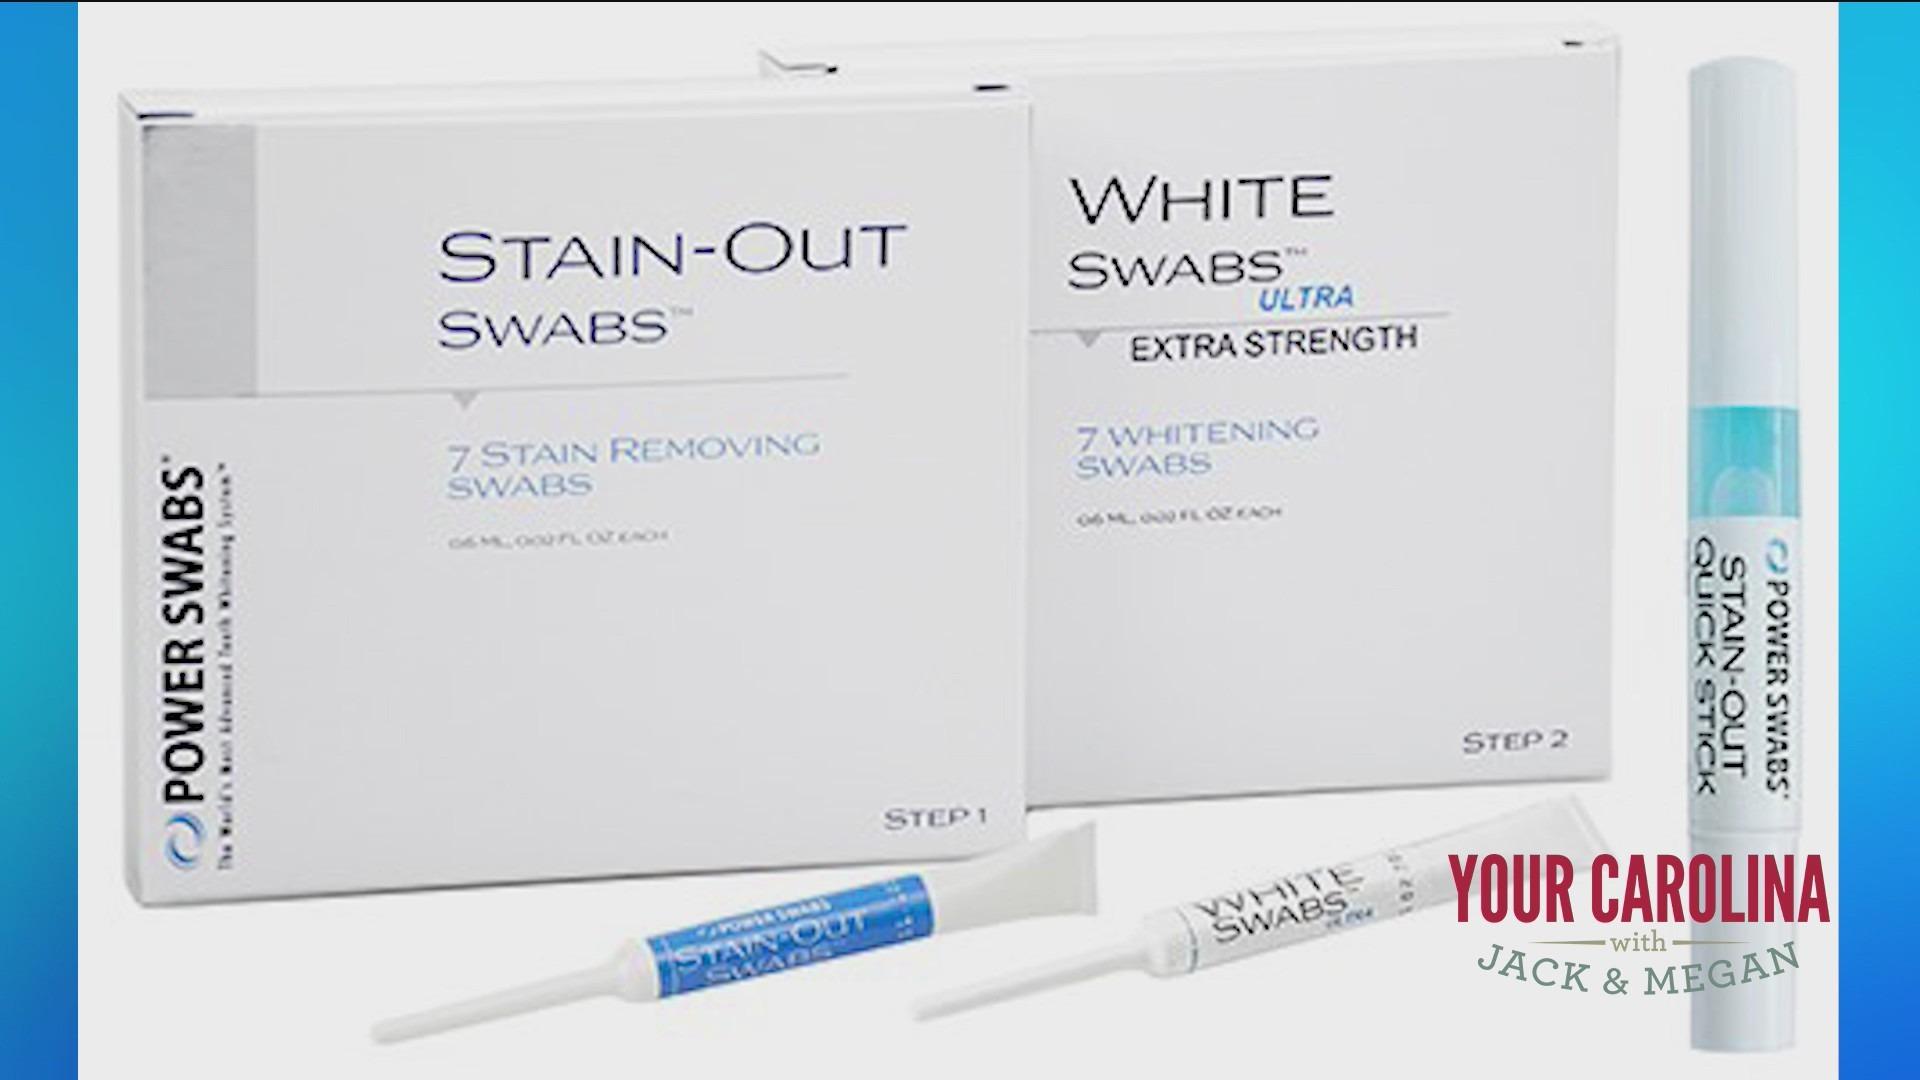 Power Swabs - The Key to a Whiter Smile